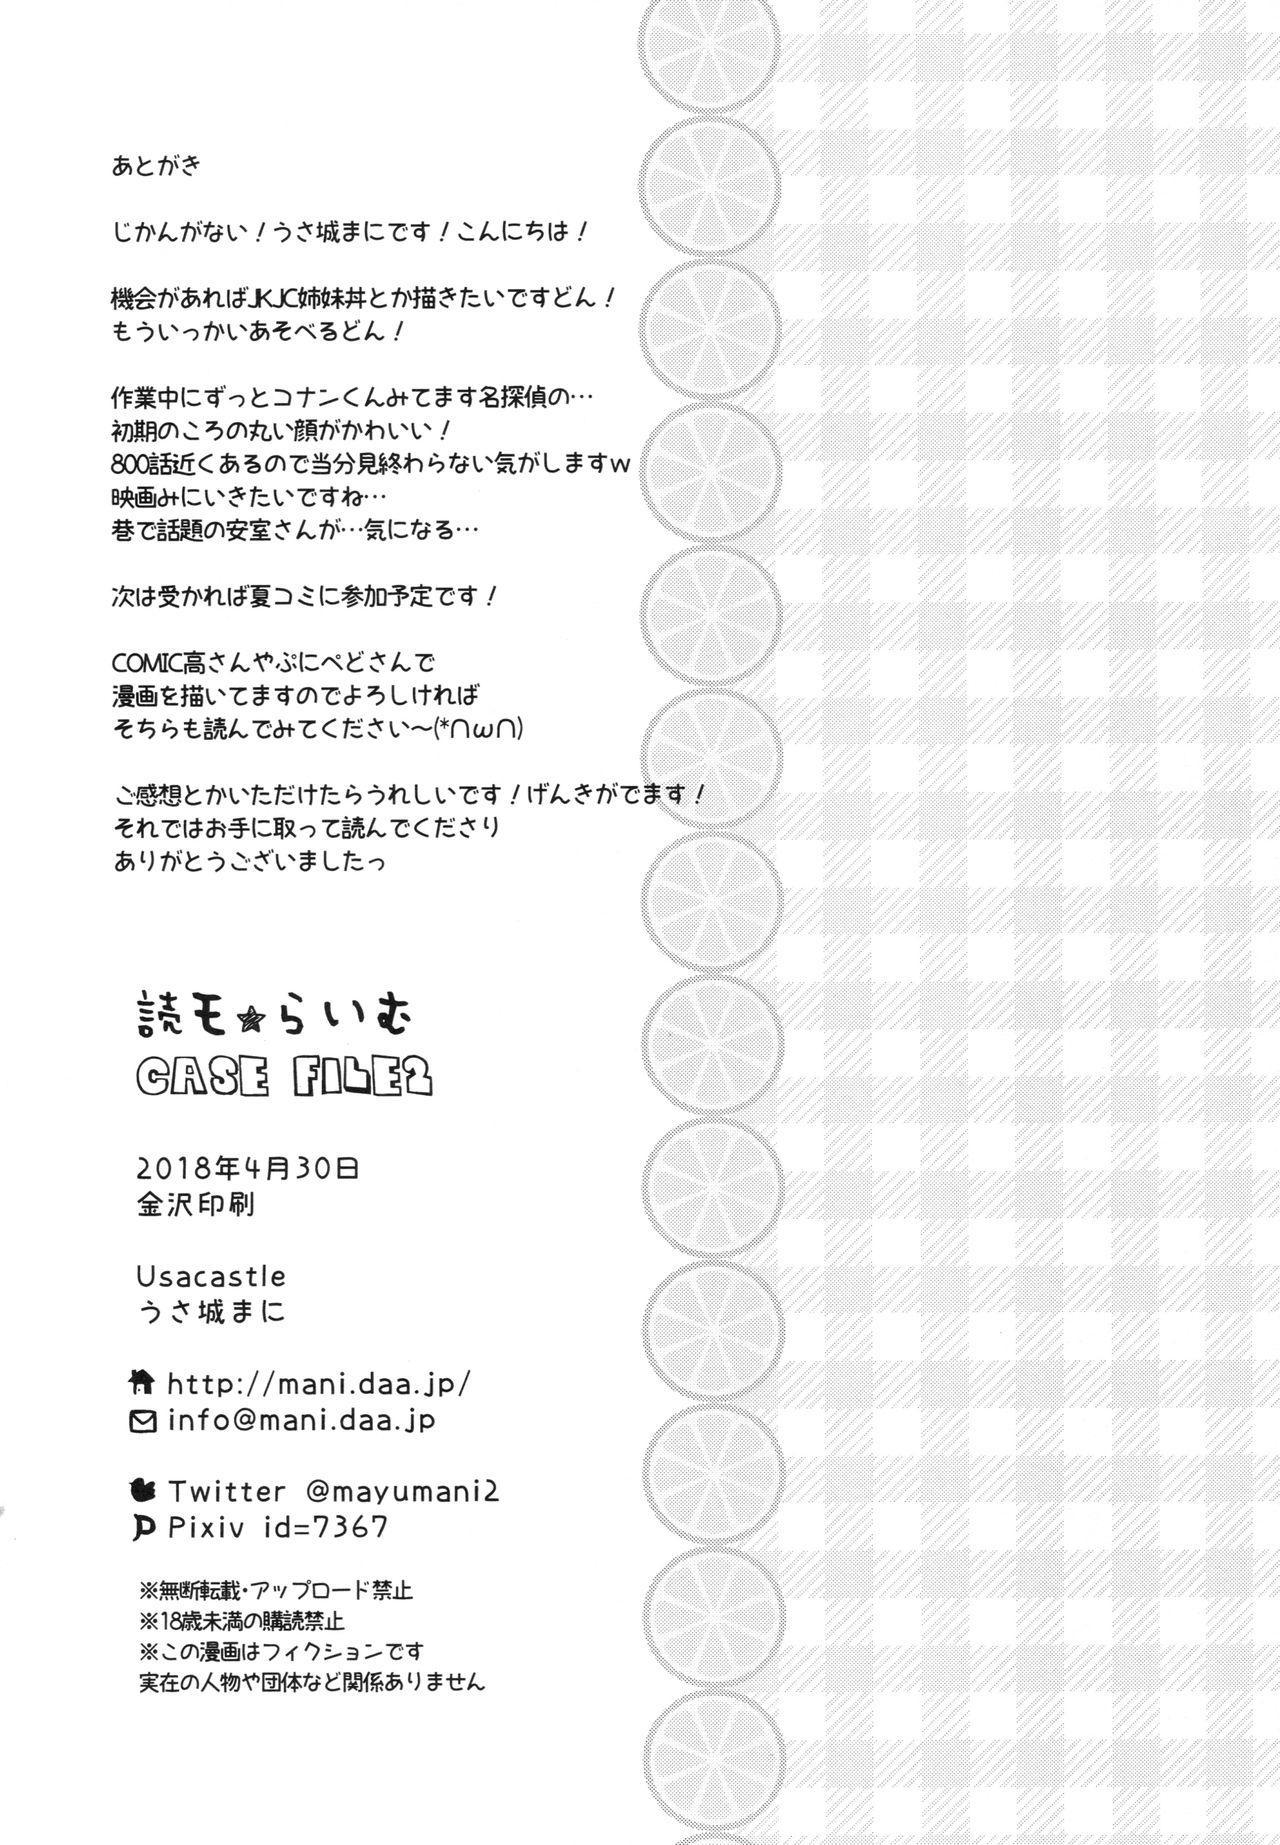 Dokumo Lime CASE FILE 2 24